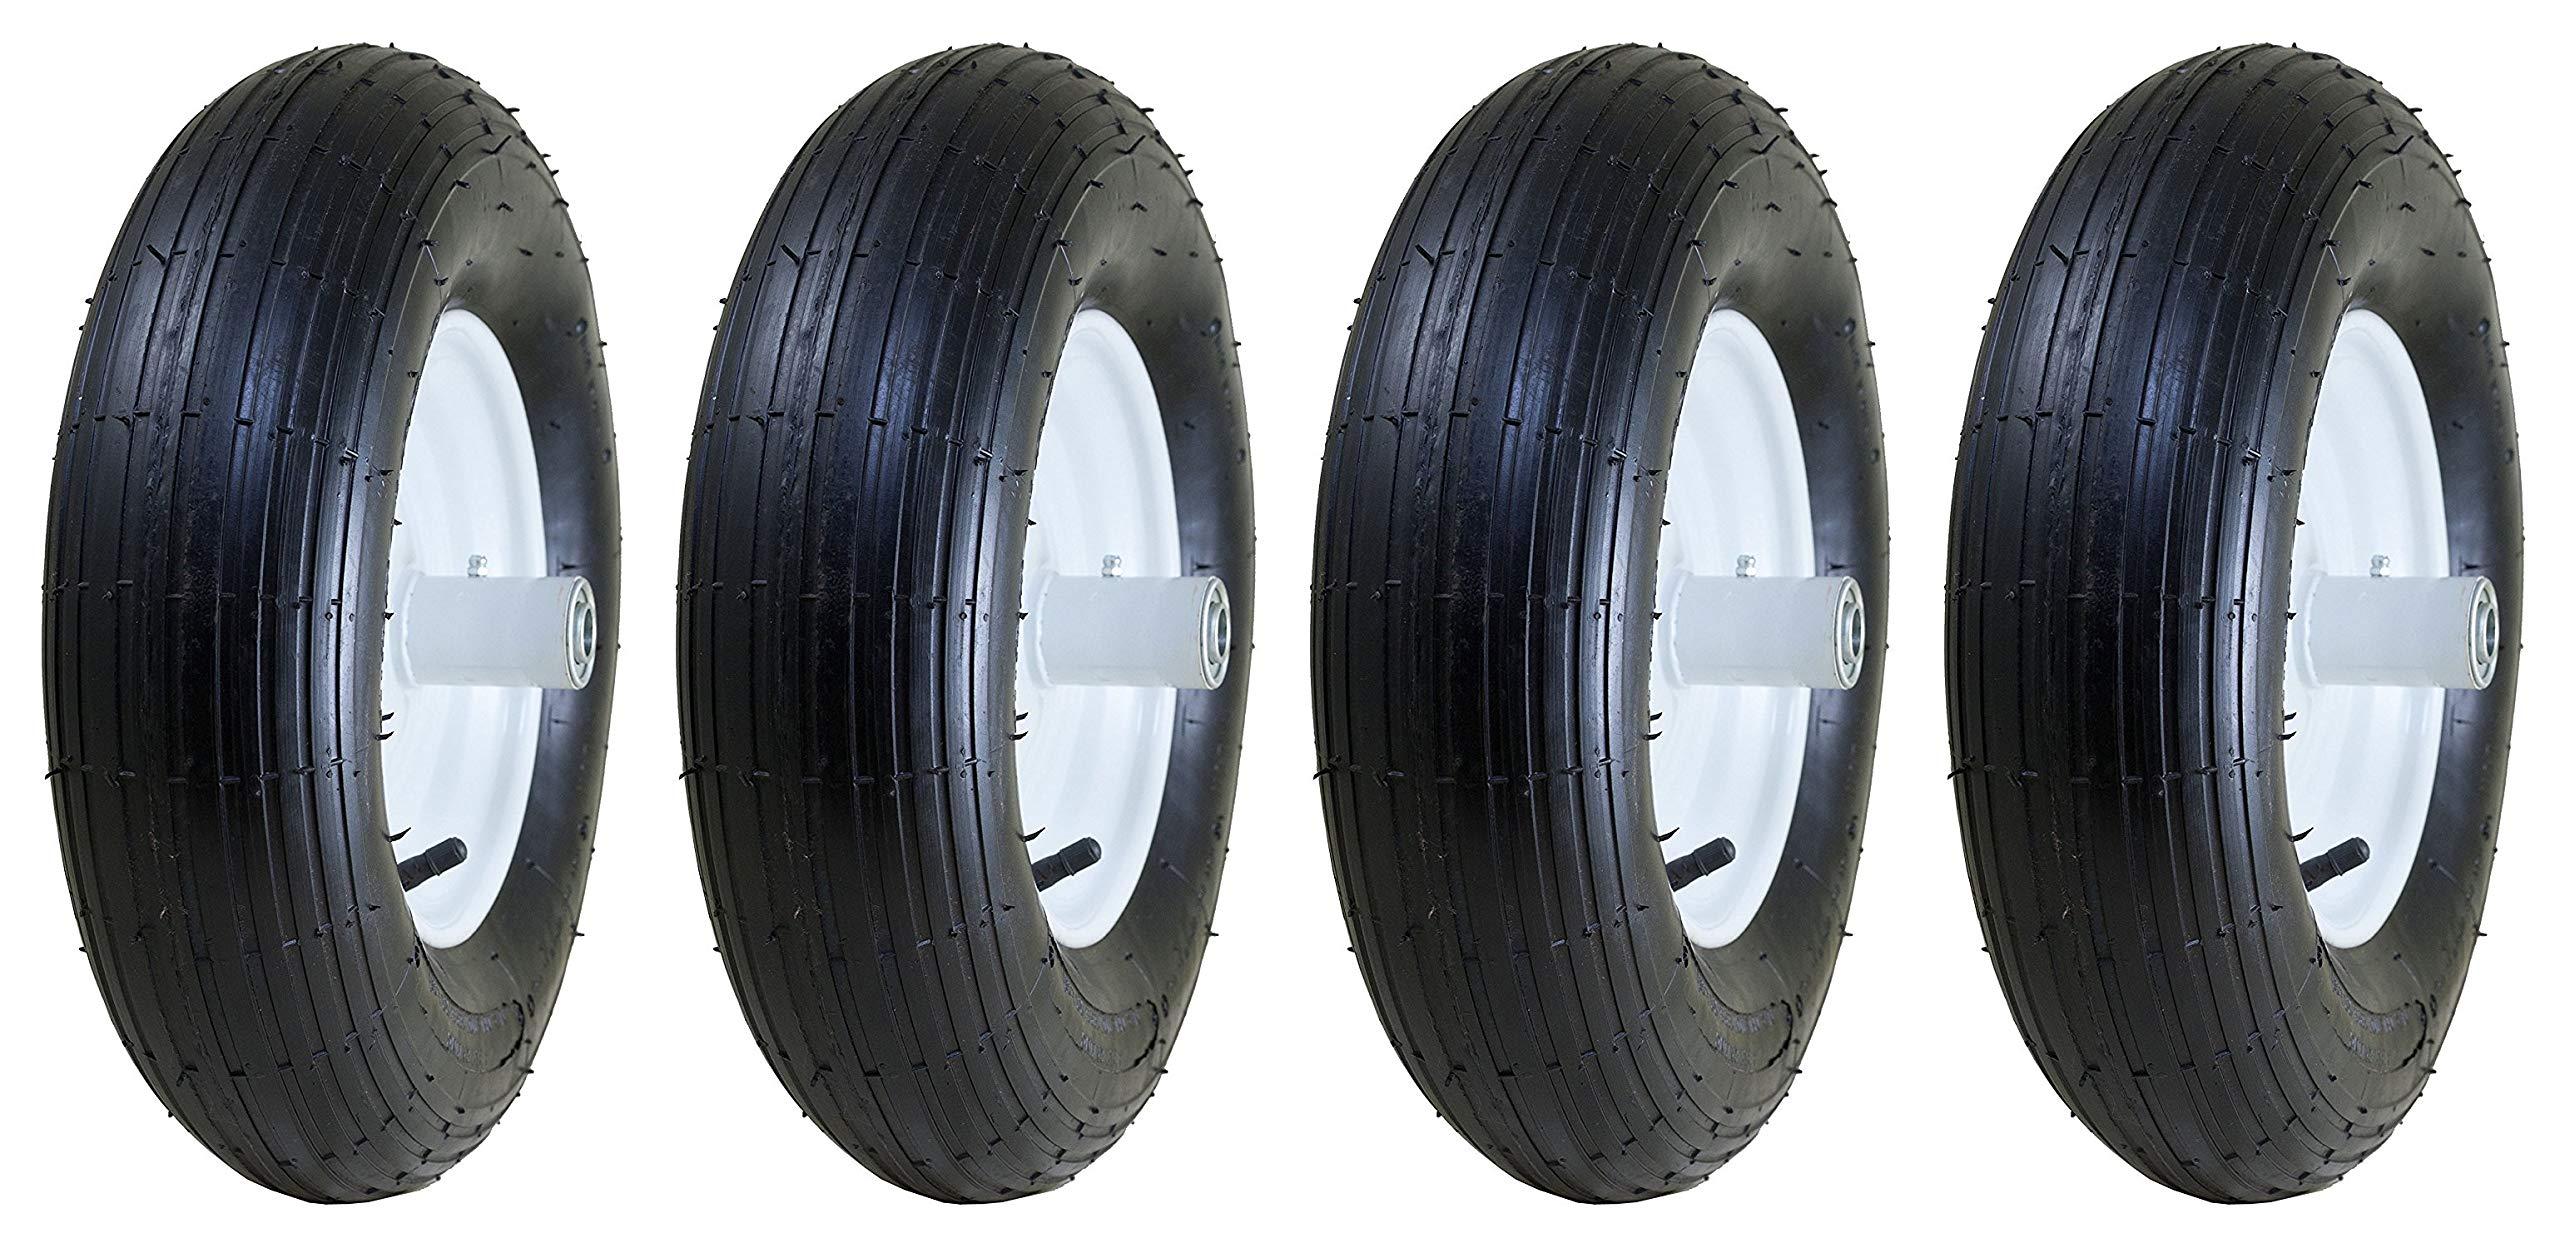 Marathon 4.80/4.00-8 Pneumatic (Air Filled) Tire on Wheel, 6 Hub, 5/8 Bearings, Ribbed Tread (Pack of 4)